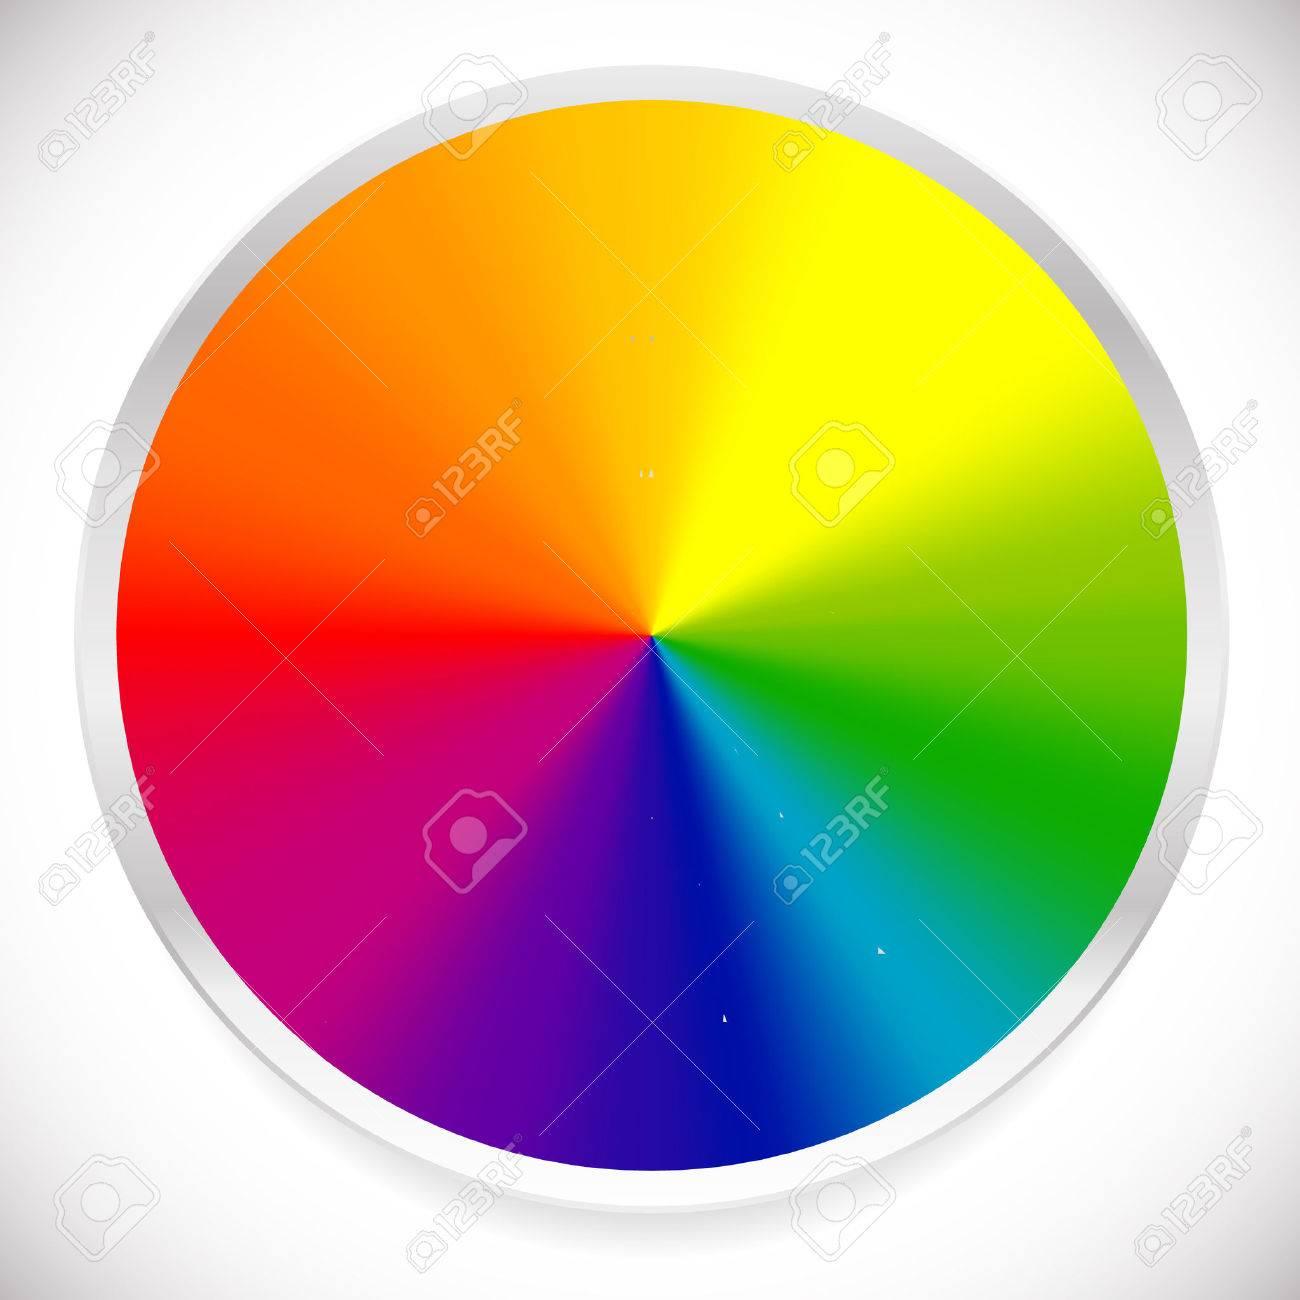 Farbrad Kreisförmig Kreis Farbpalette Mit Lebendigen Leuchtenden